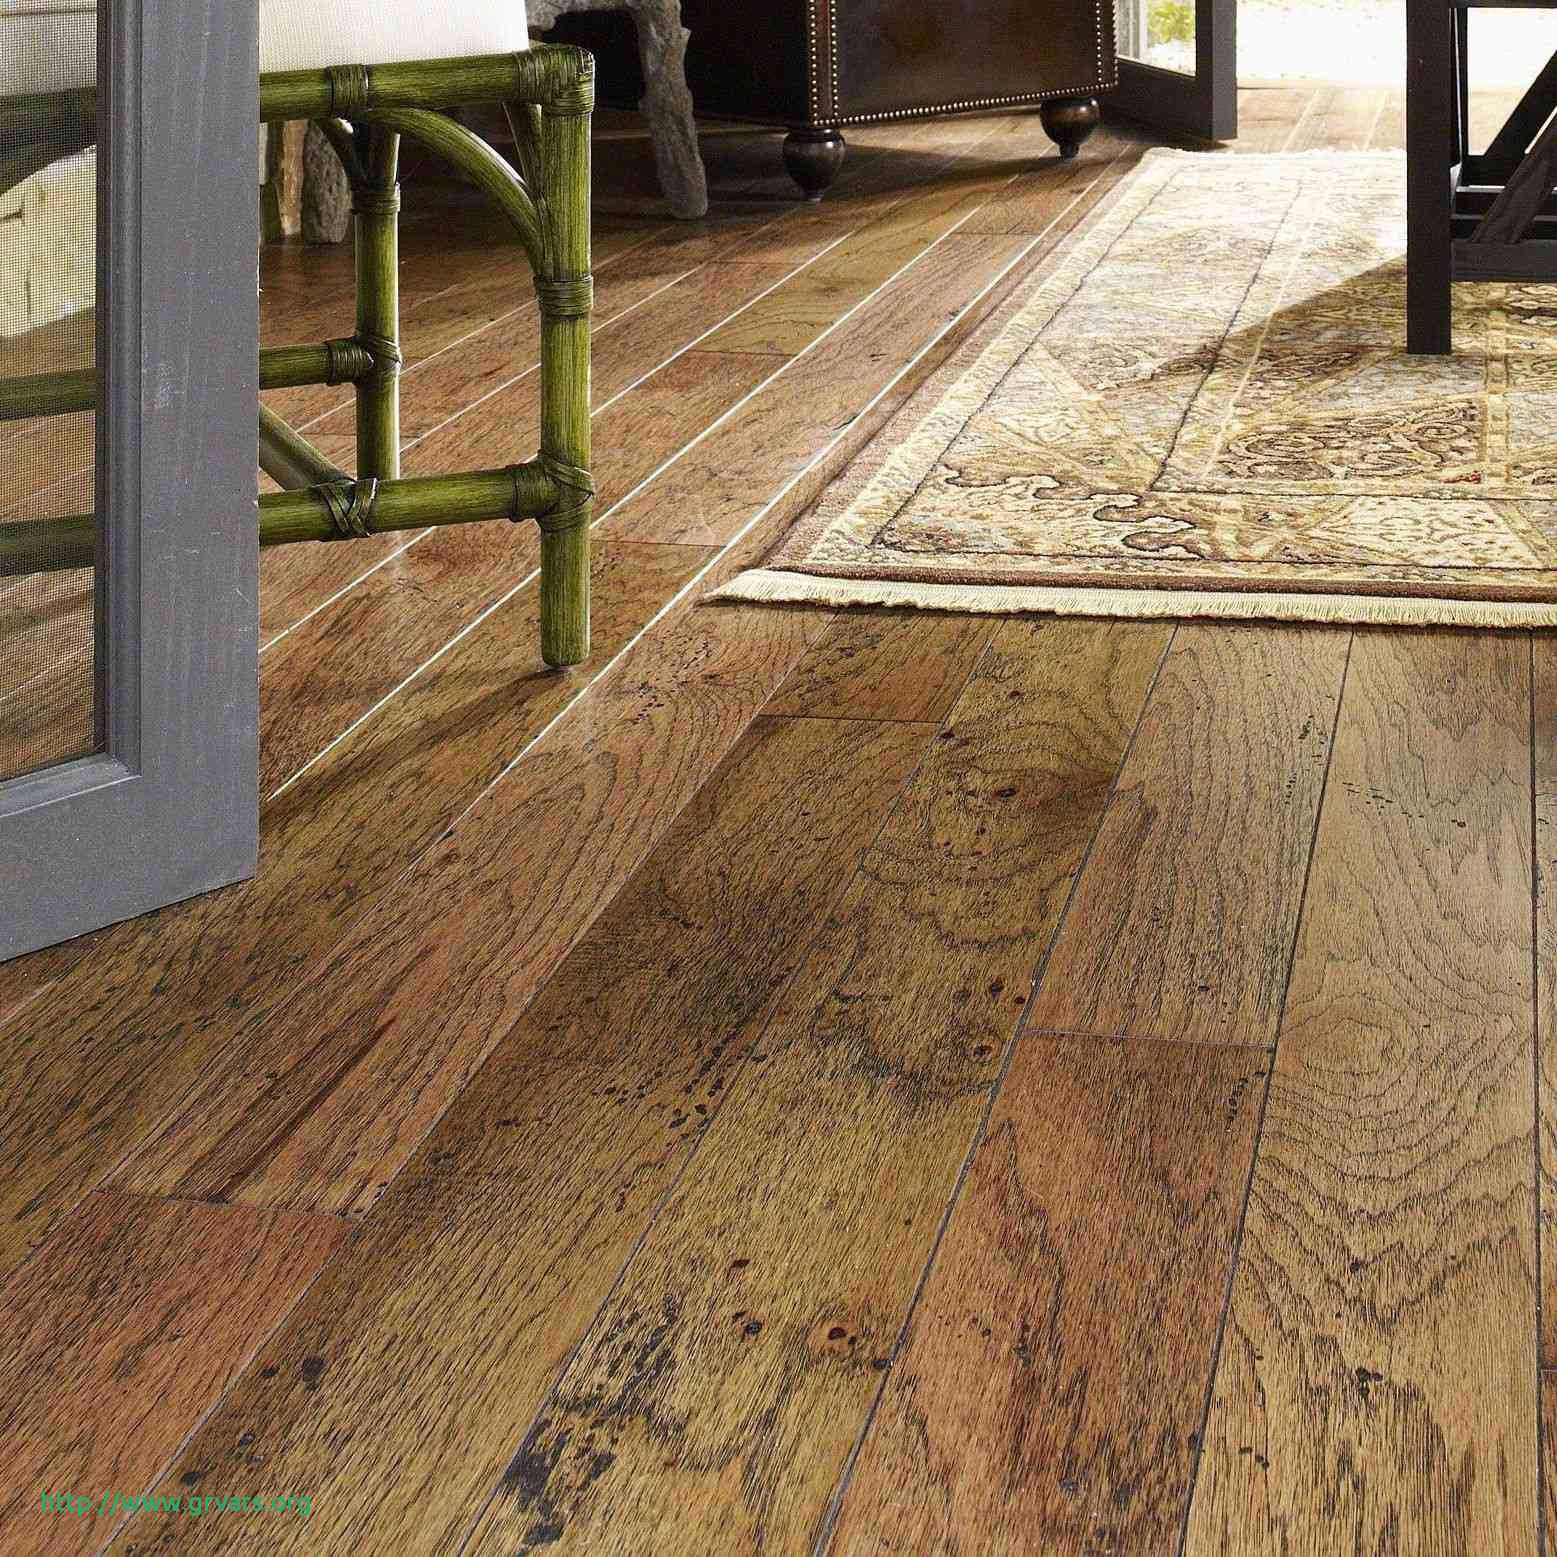 vinegar and hardwood floors of 23 frais how much is a hardwood floor ideas blog in hardwood floor designs new best type wood flooring best floor floor wood floor wood 0d